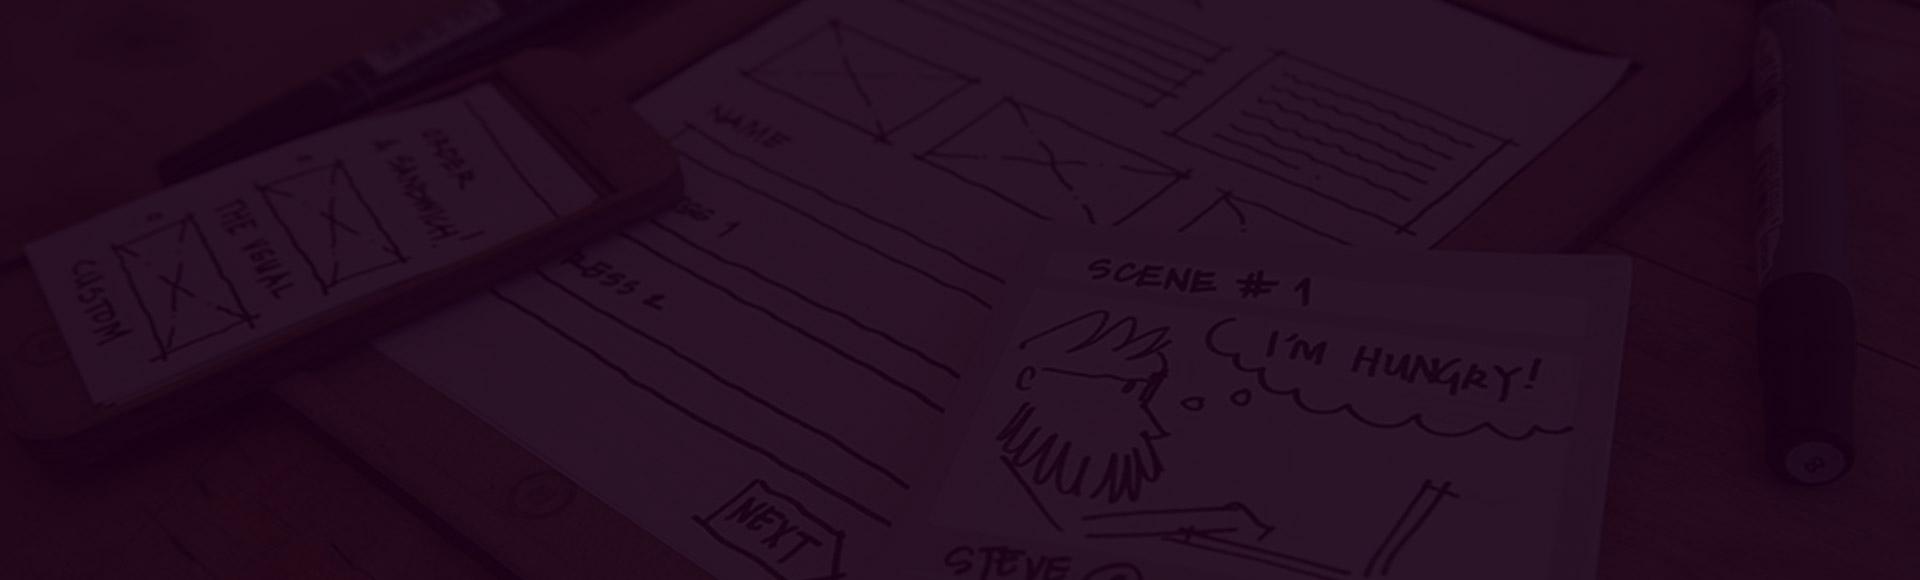 UI-Prototyping-bg_01